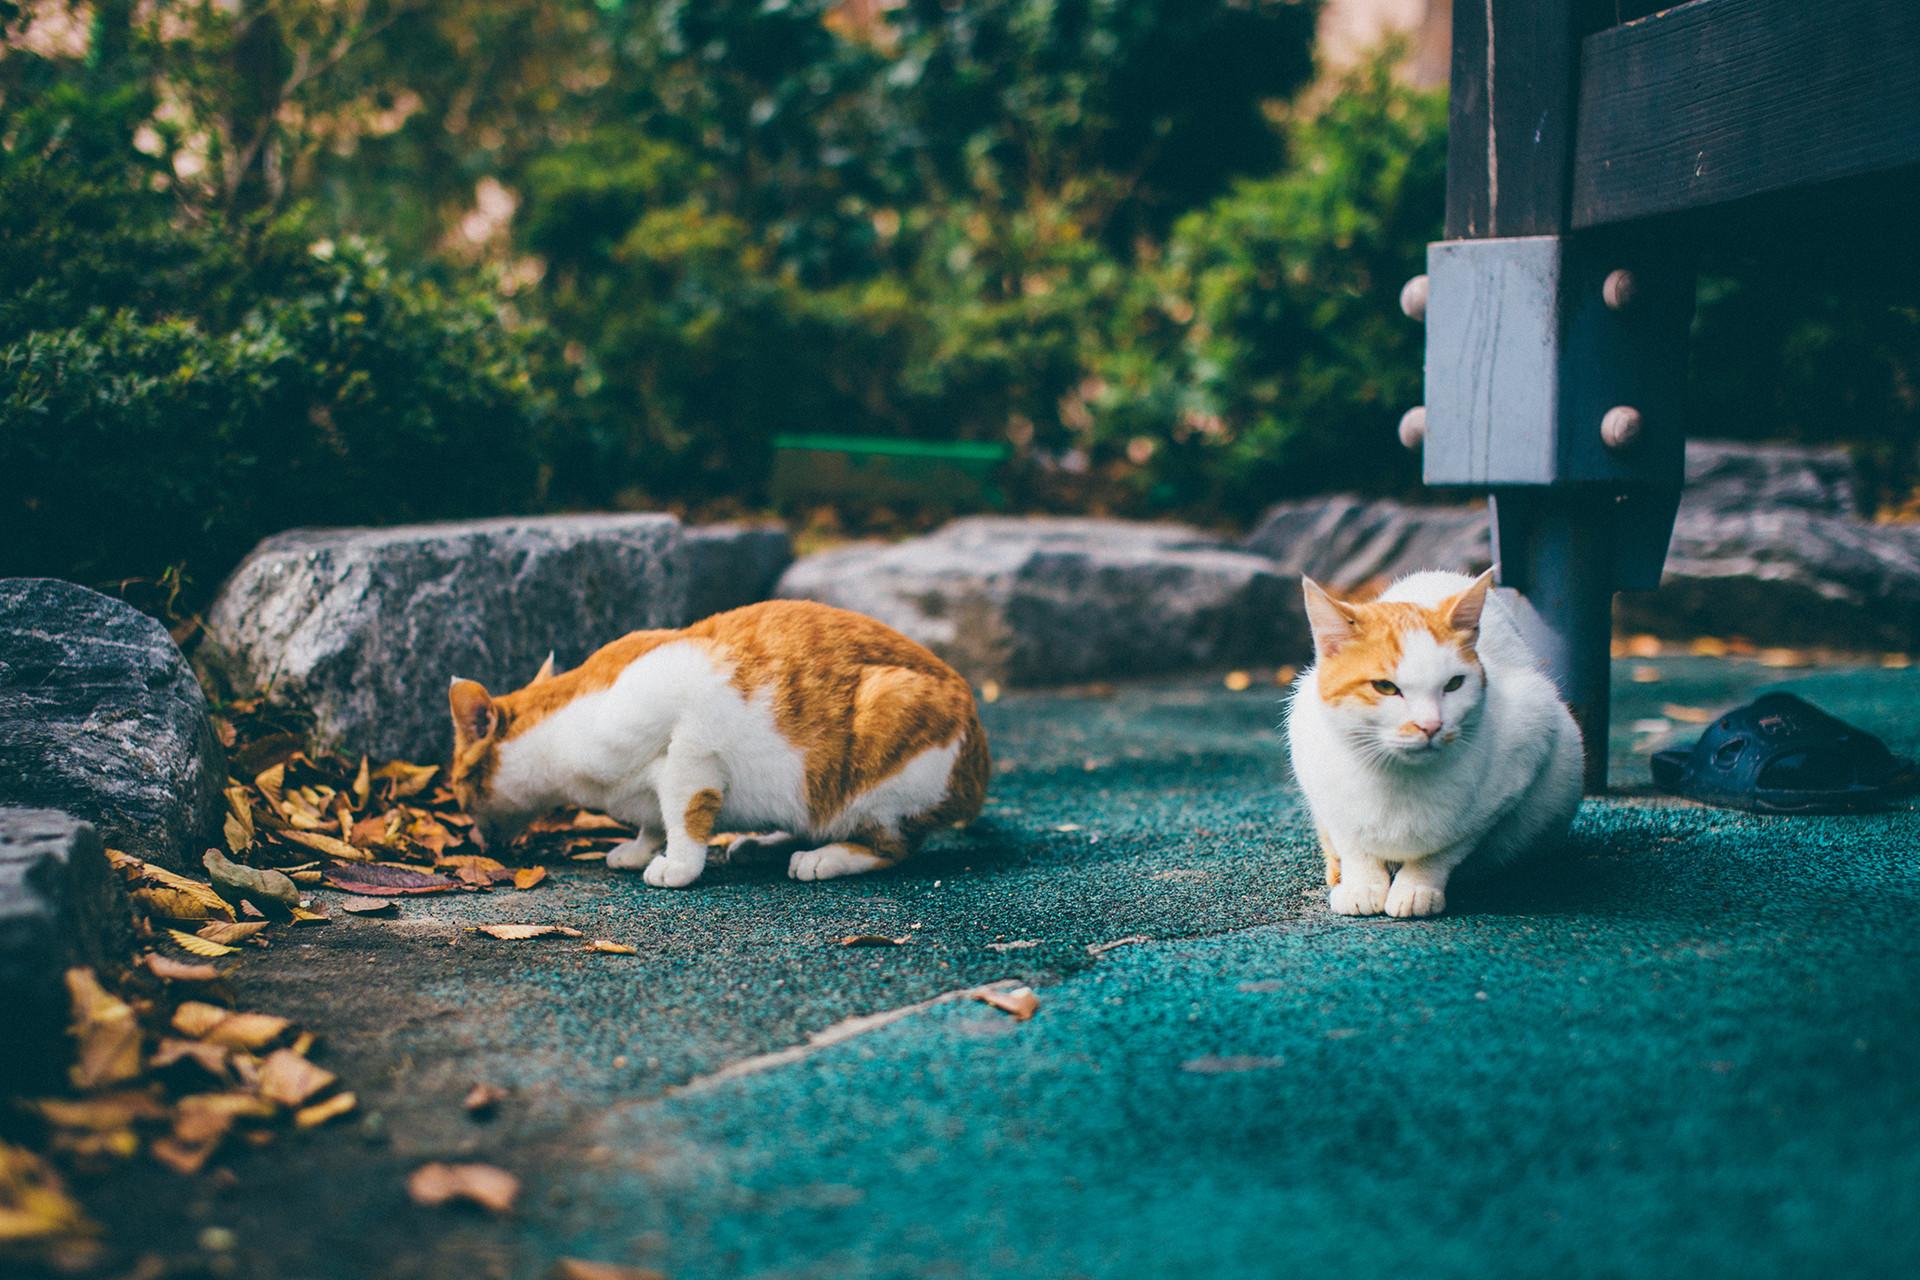 Gamcheon Culture Village Cat Cute Korea Travel Trip Malaysia Kuala Lumpur Melaka Johor Photography Top Best  Photographer 韓國 旅行  釜山 甘村文化村 Jens Kv